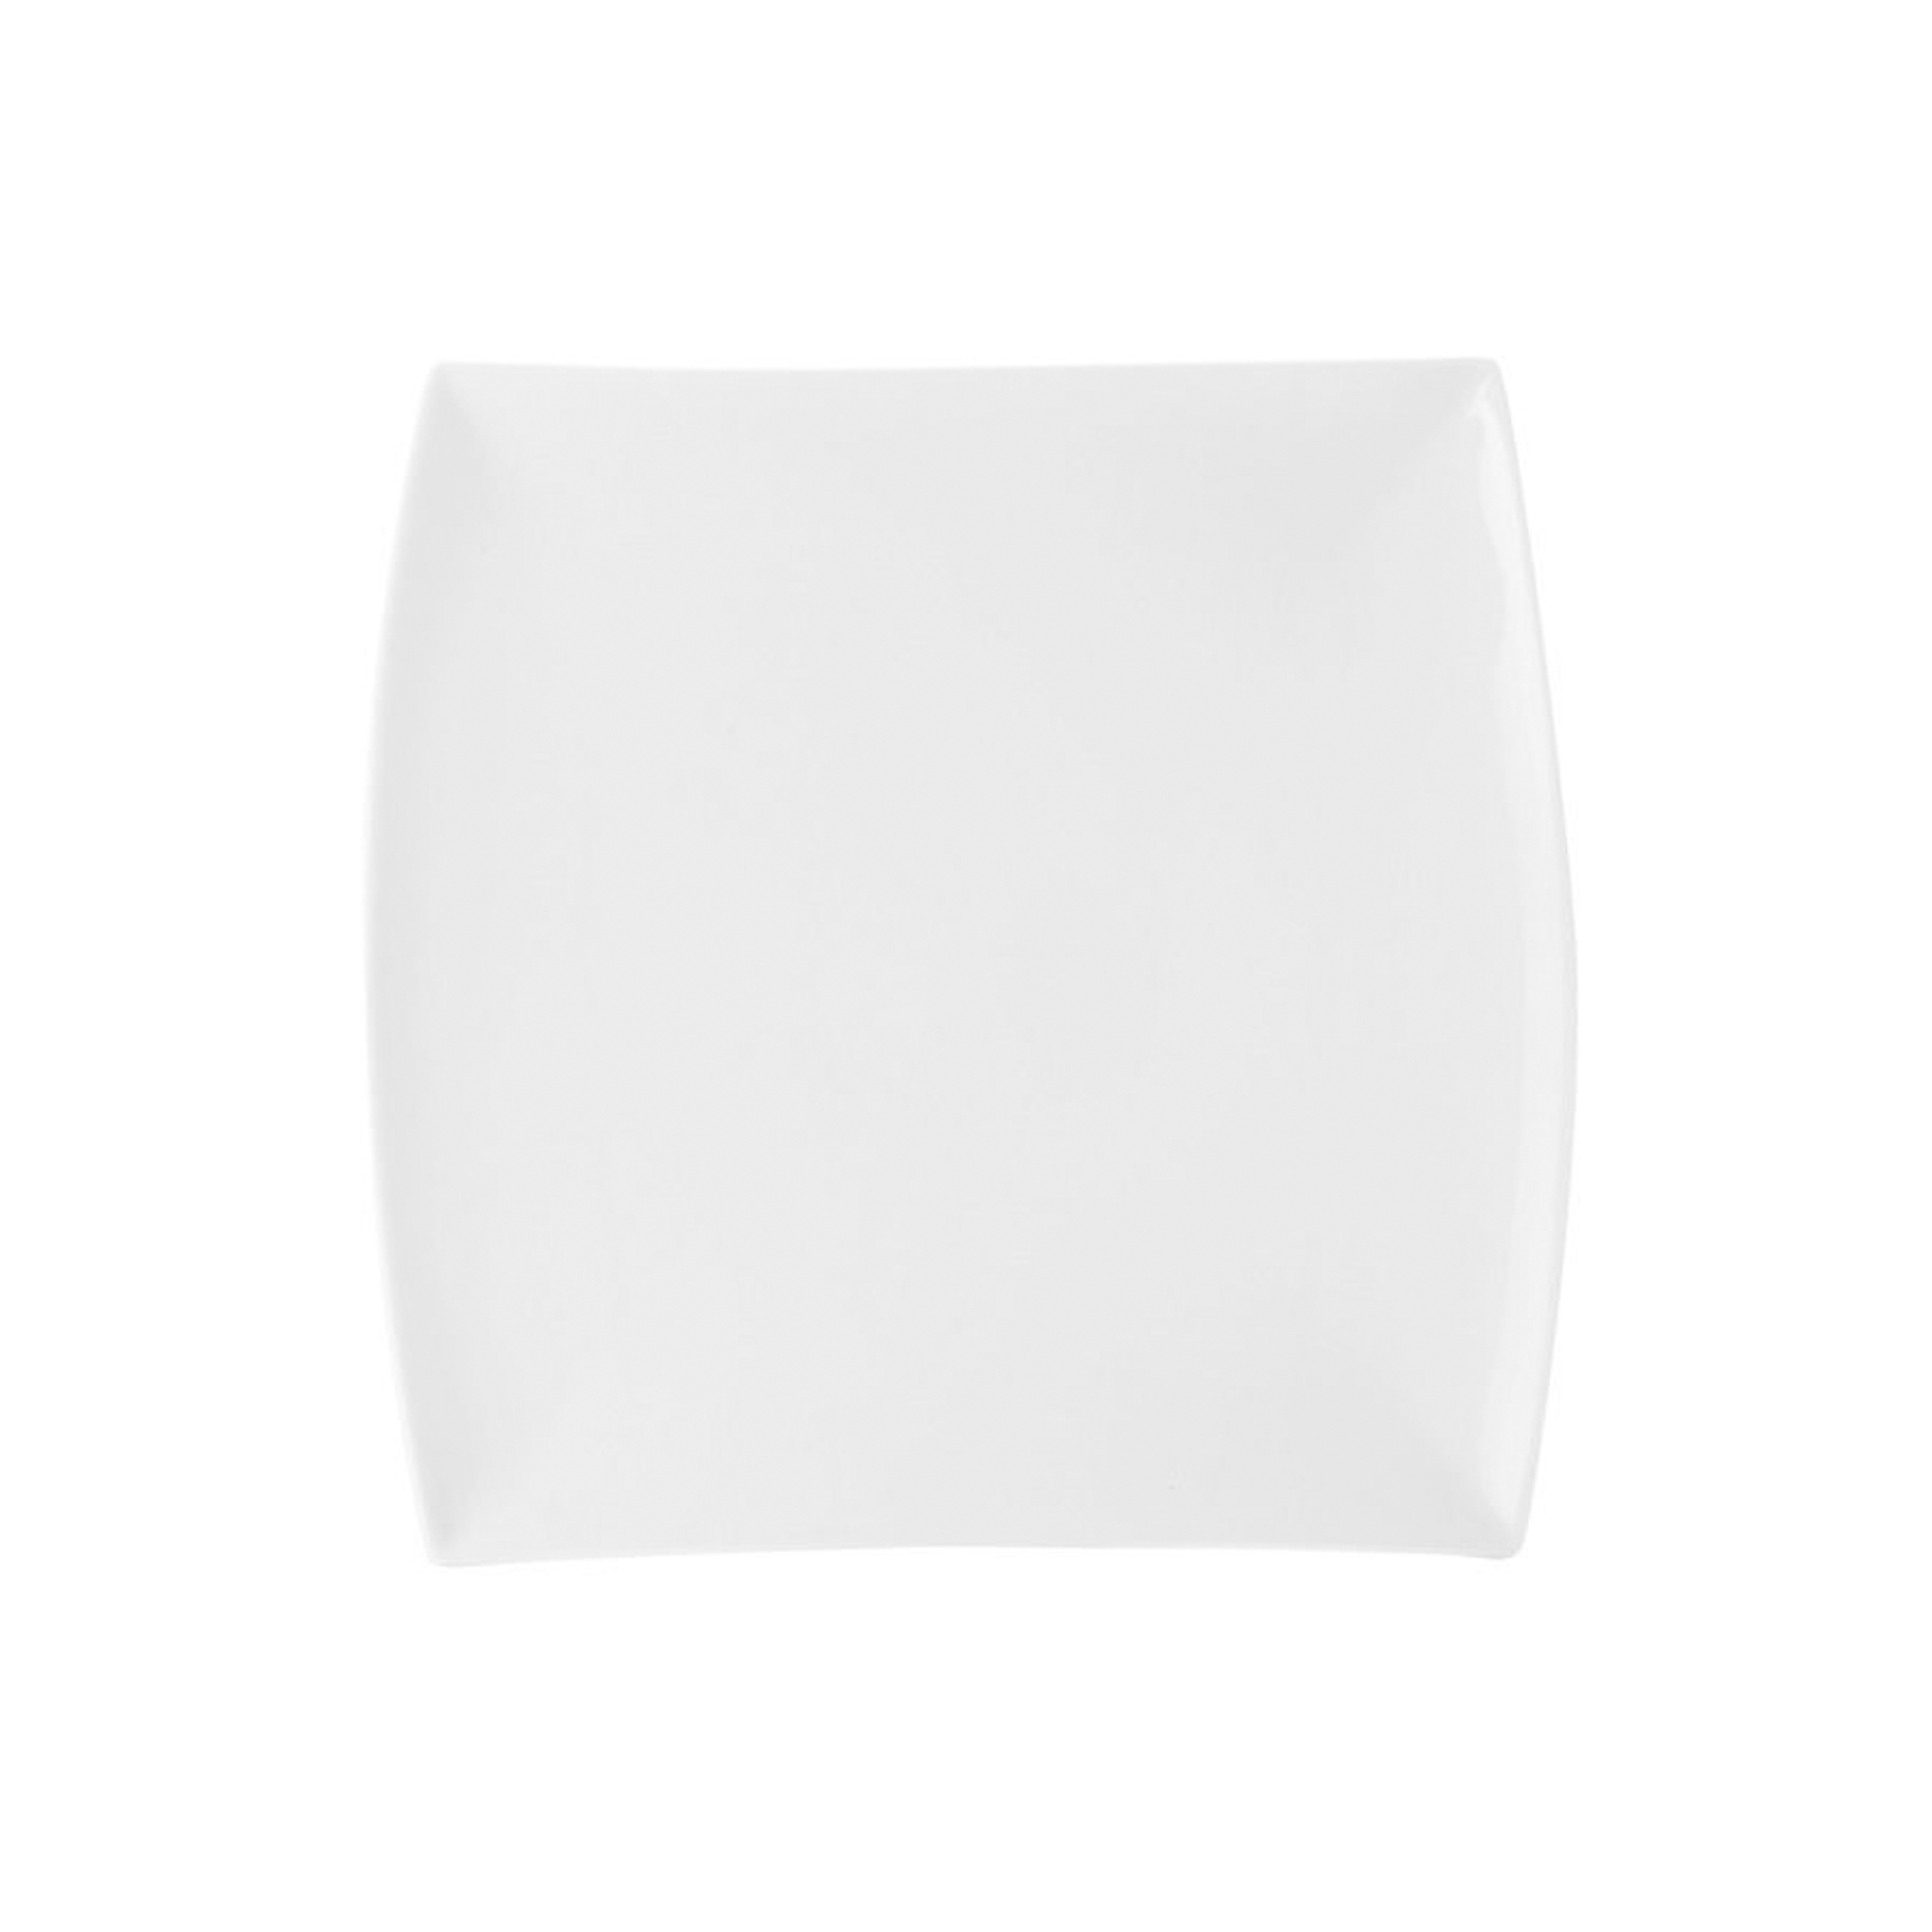 Тарелка квадратная Maxwell & Williams Восток-Запад 26 см фото